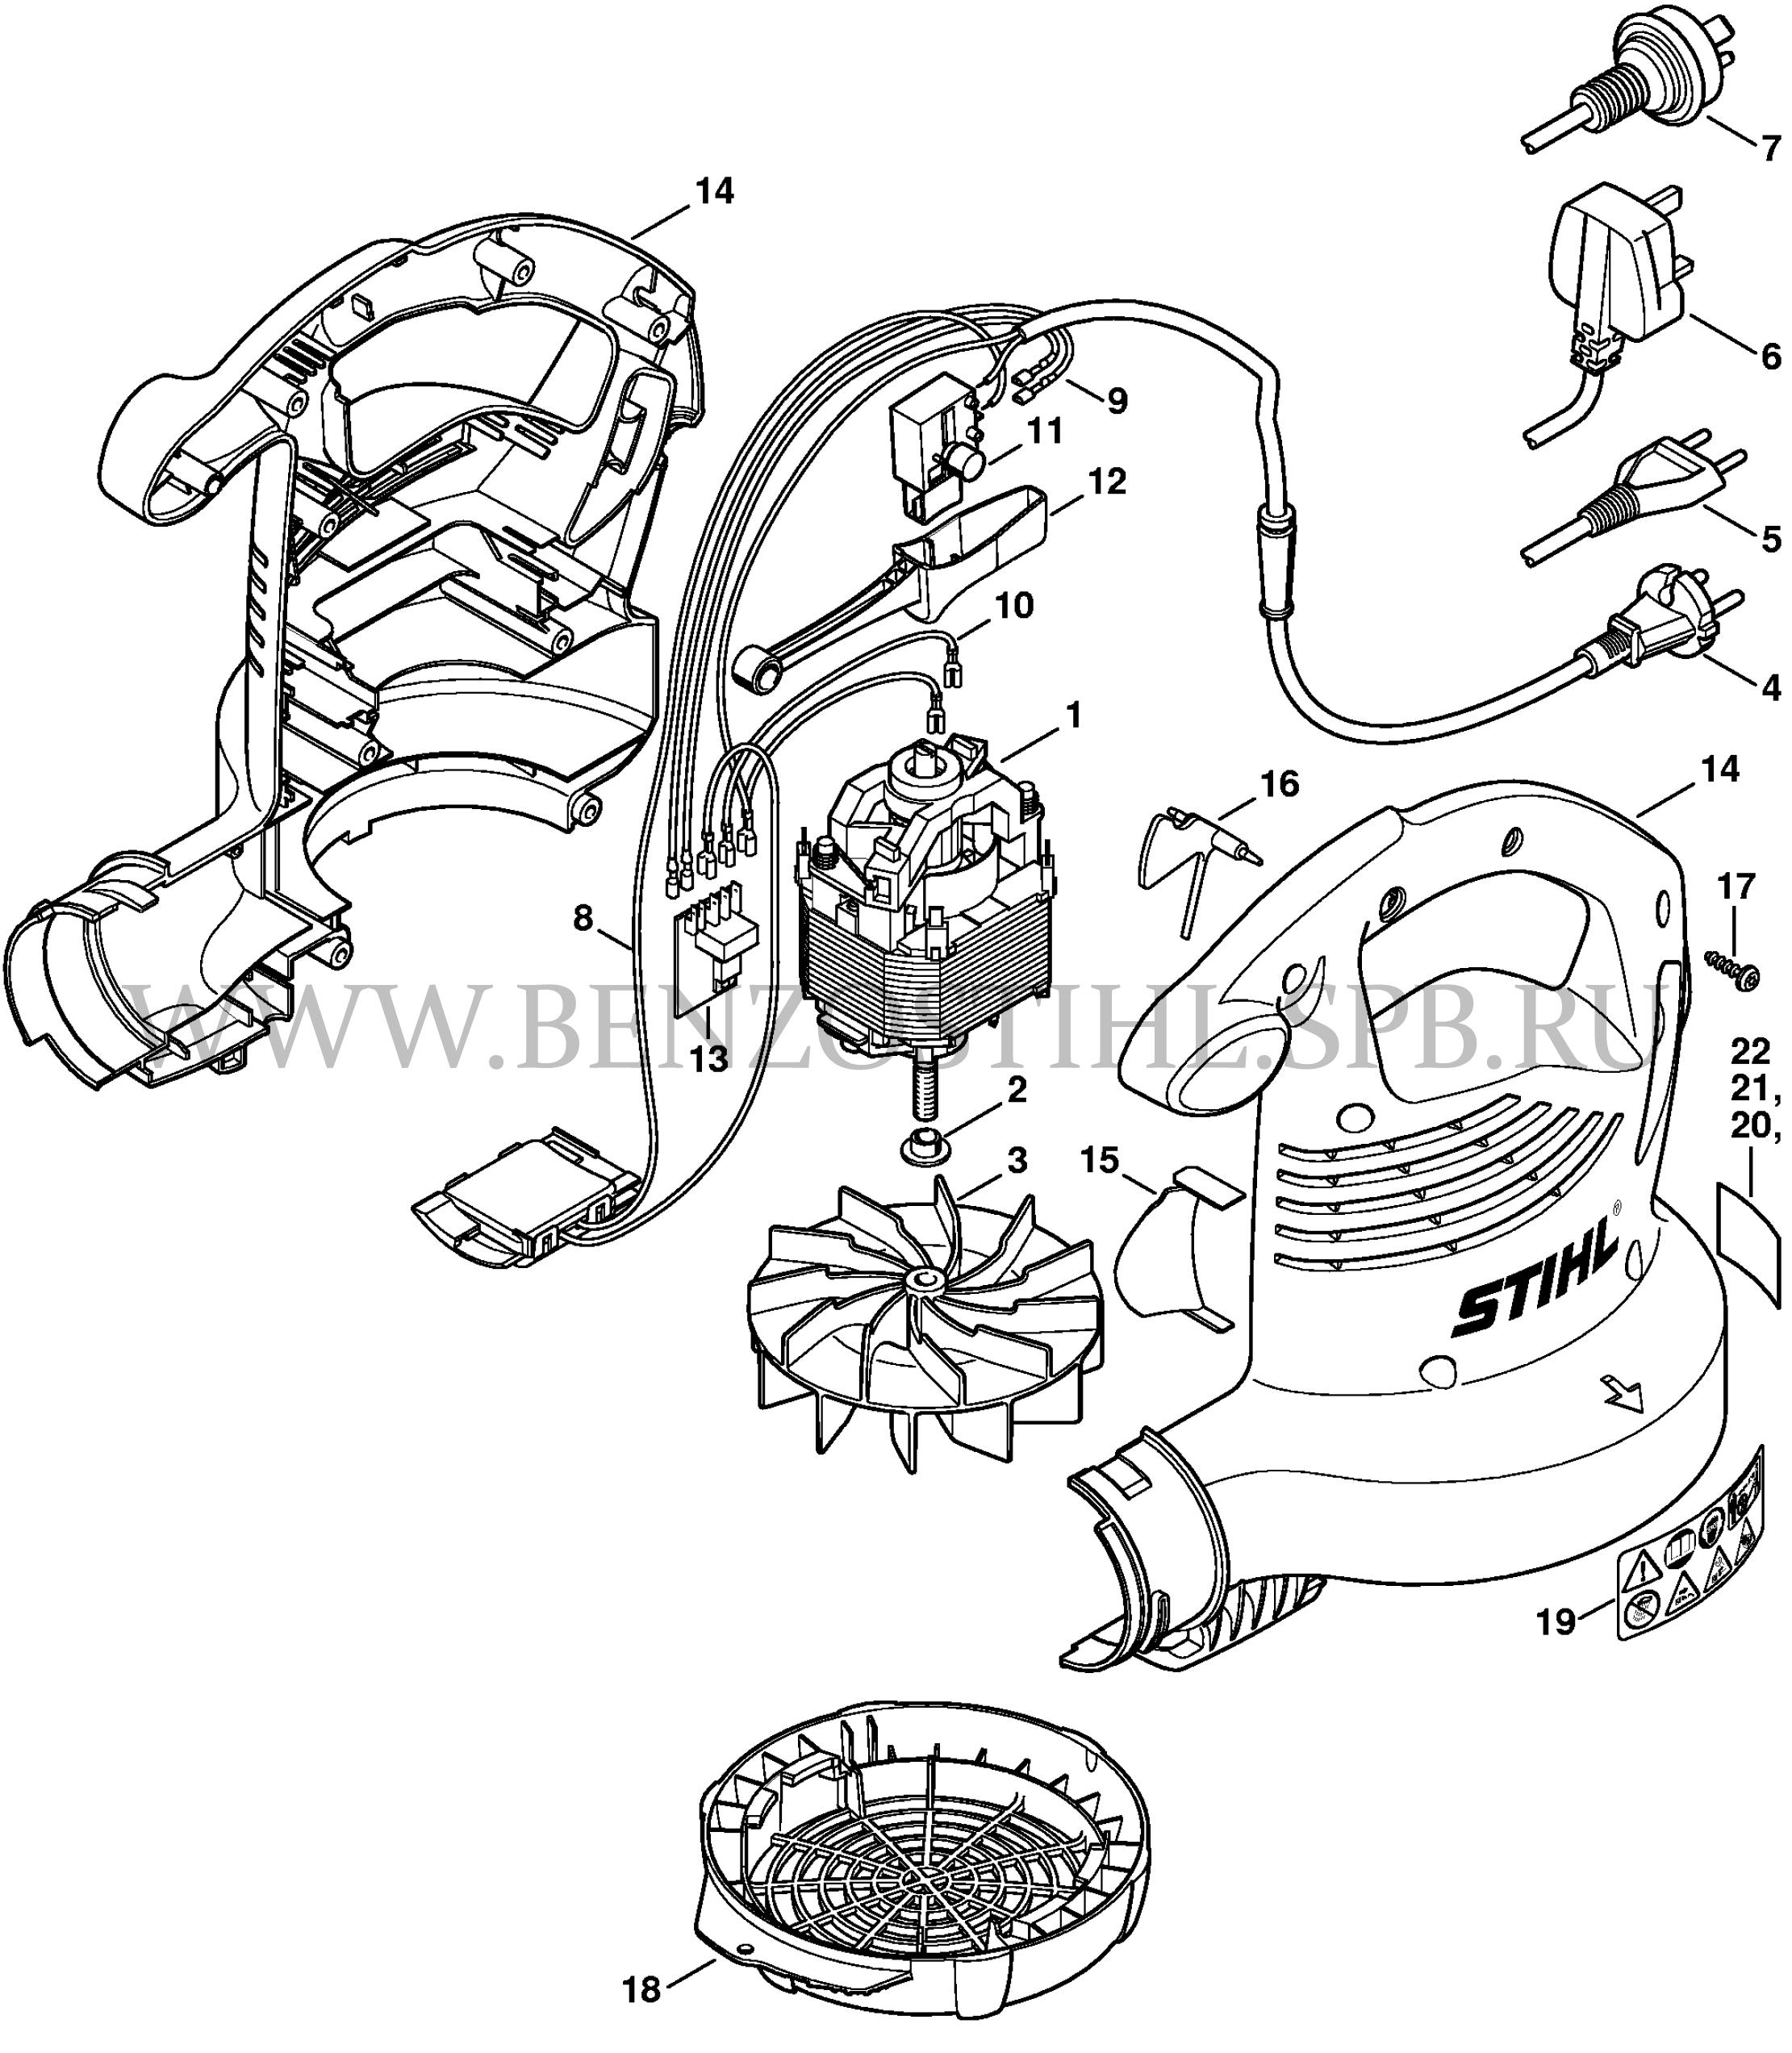 she 81: Электродвигатель - Корпус вентилятора